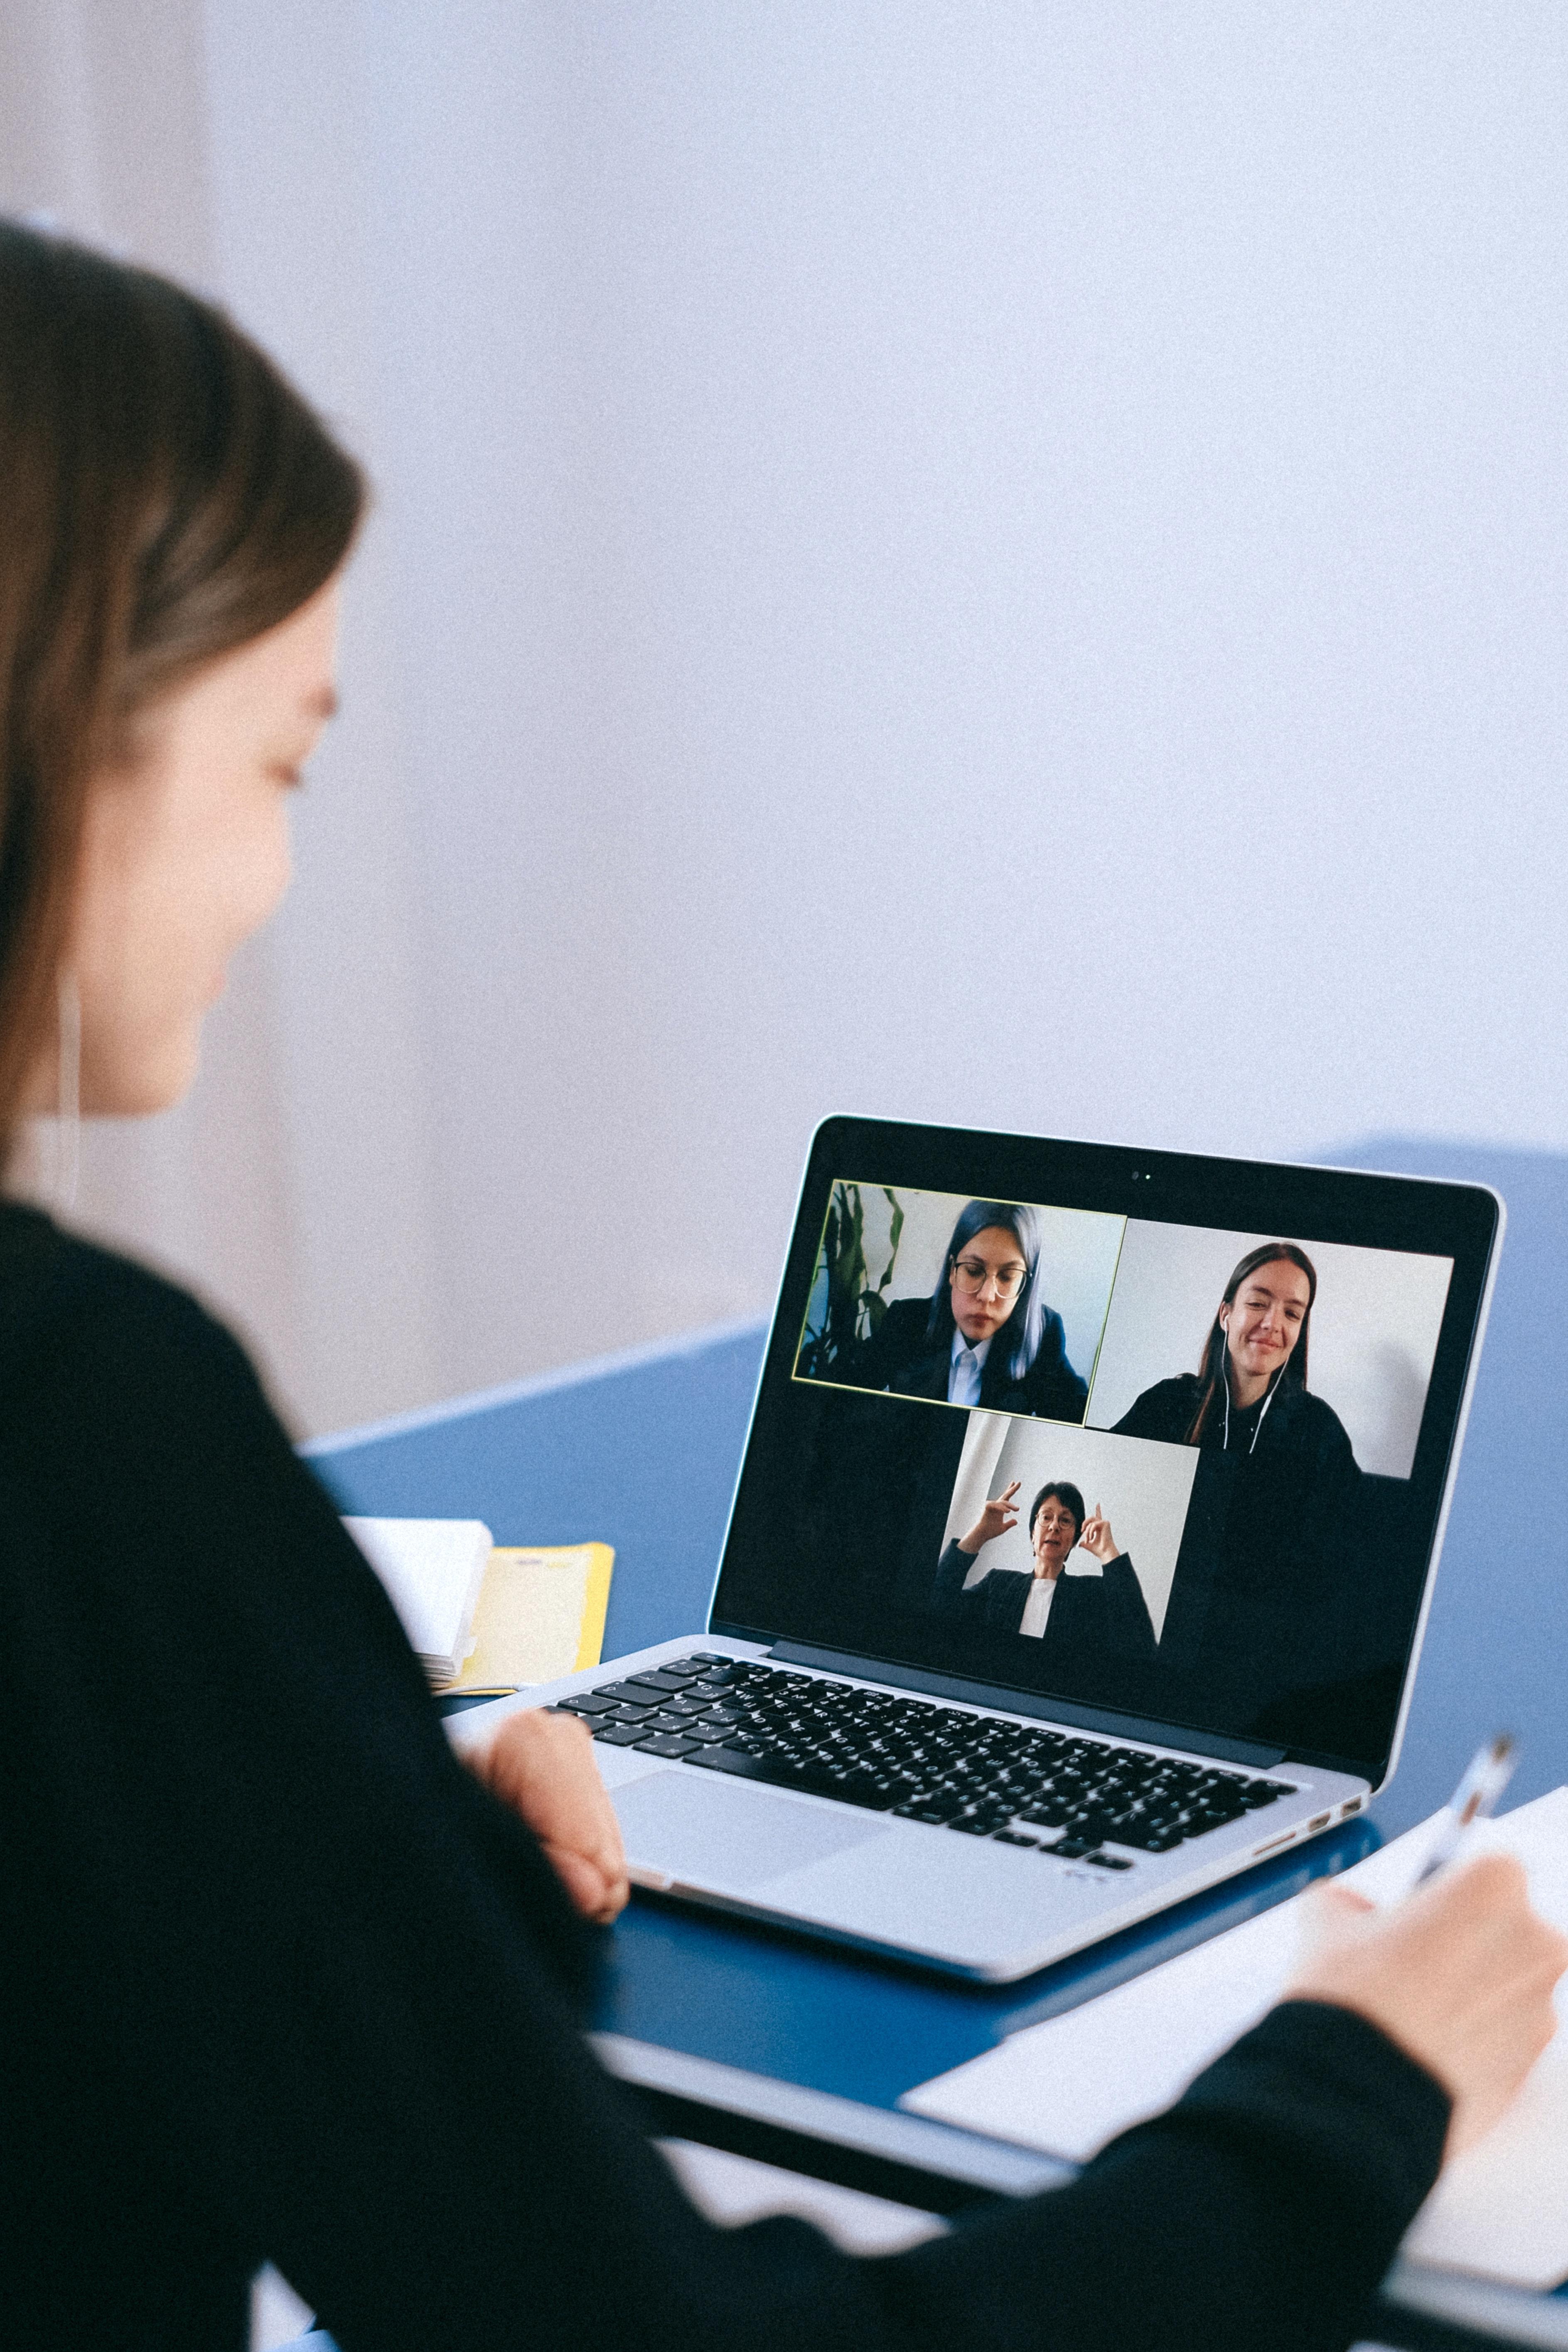 Video Interview Techniques: The Basics